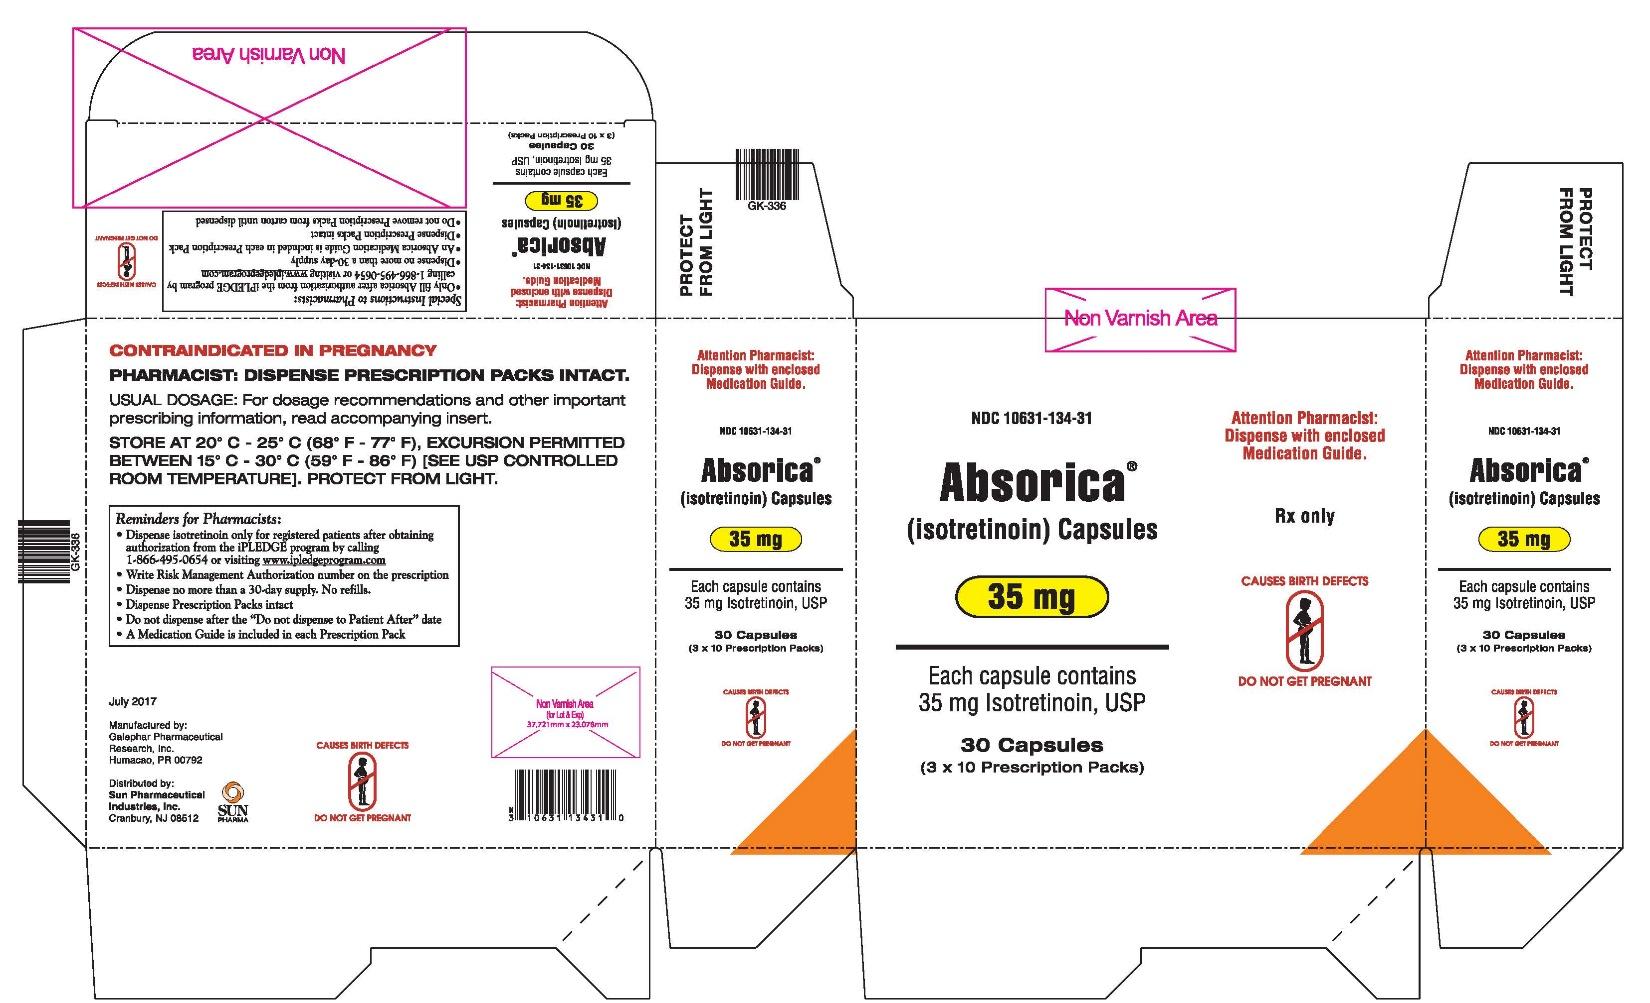 Absorica 35 mg Carton